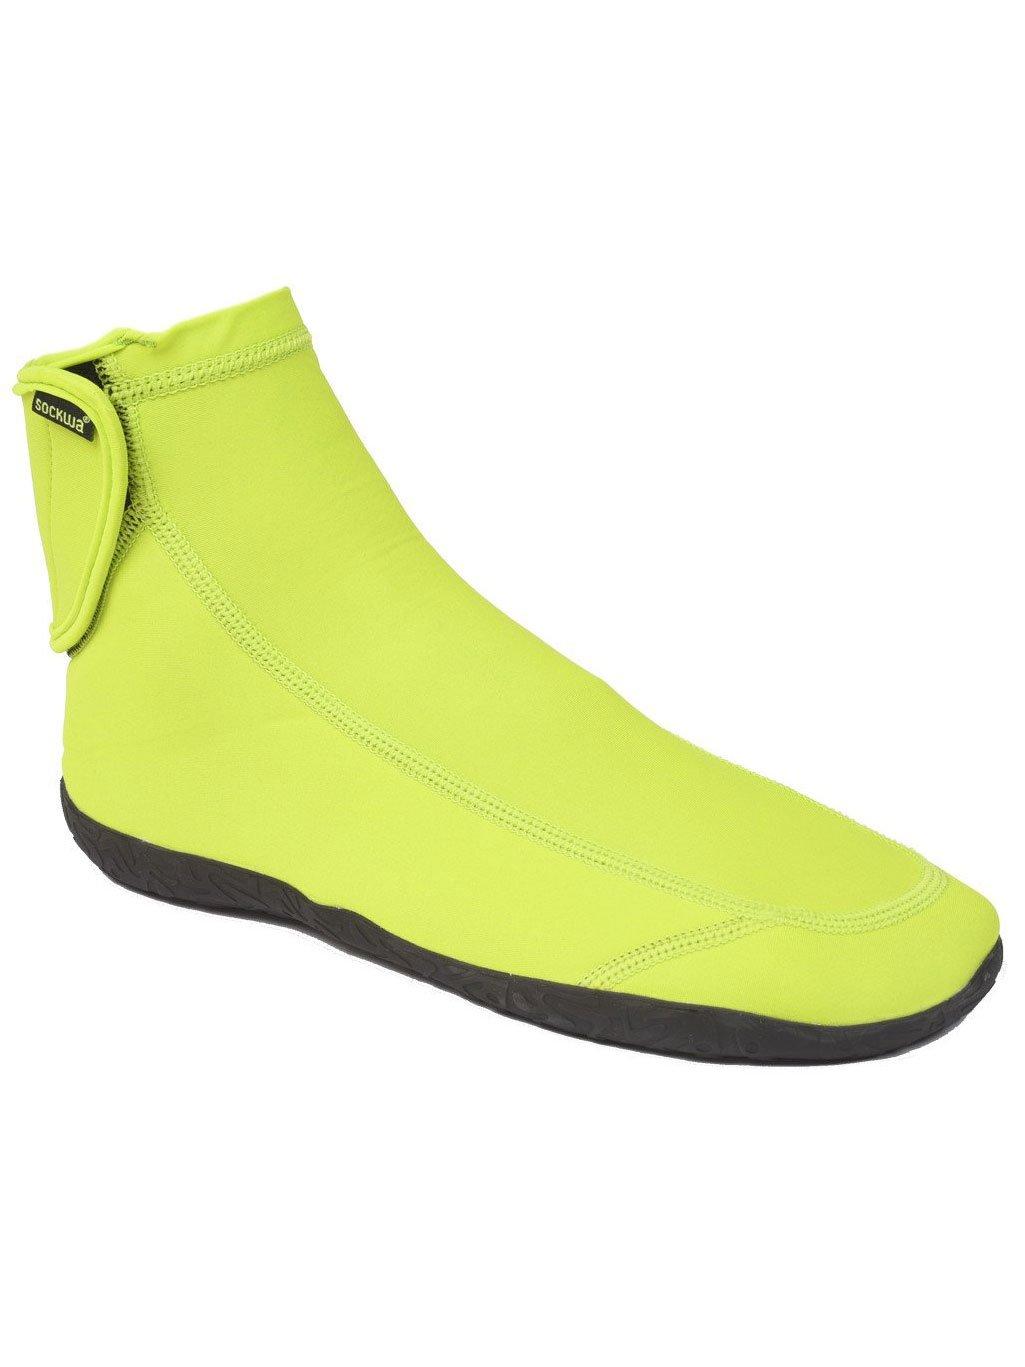 Sockwa G-HI Minimal Beach Sneaker B01MSCDOM7 Mens 11/Womens 12|Lime